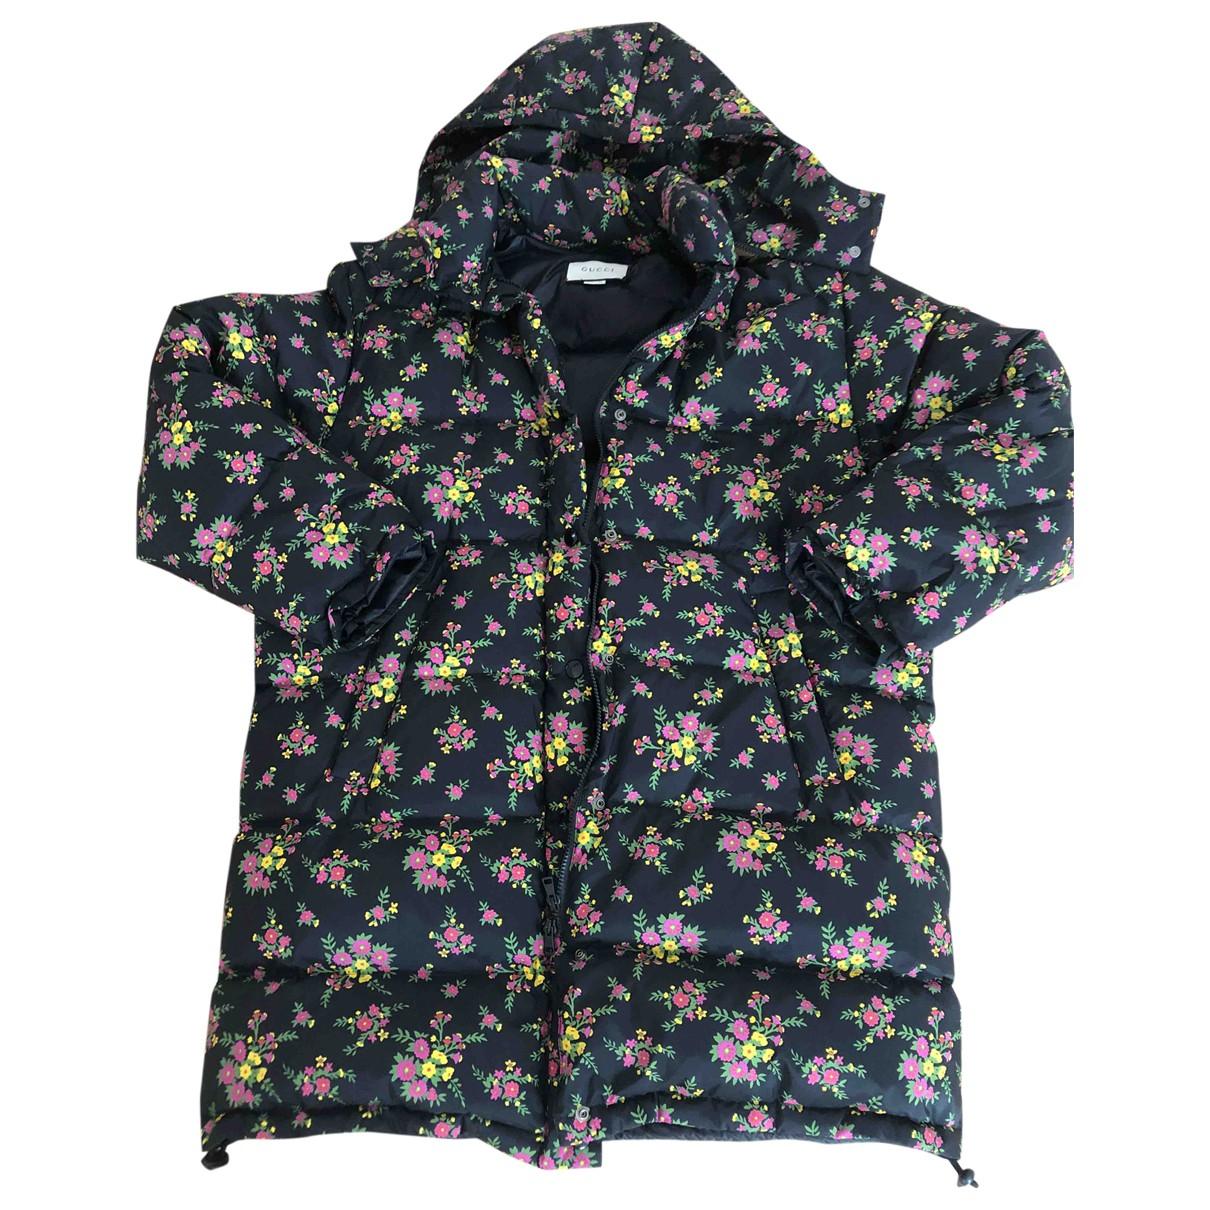 Gucci \N Black coat for Women 38 IT